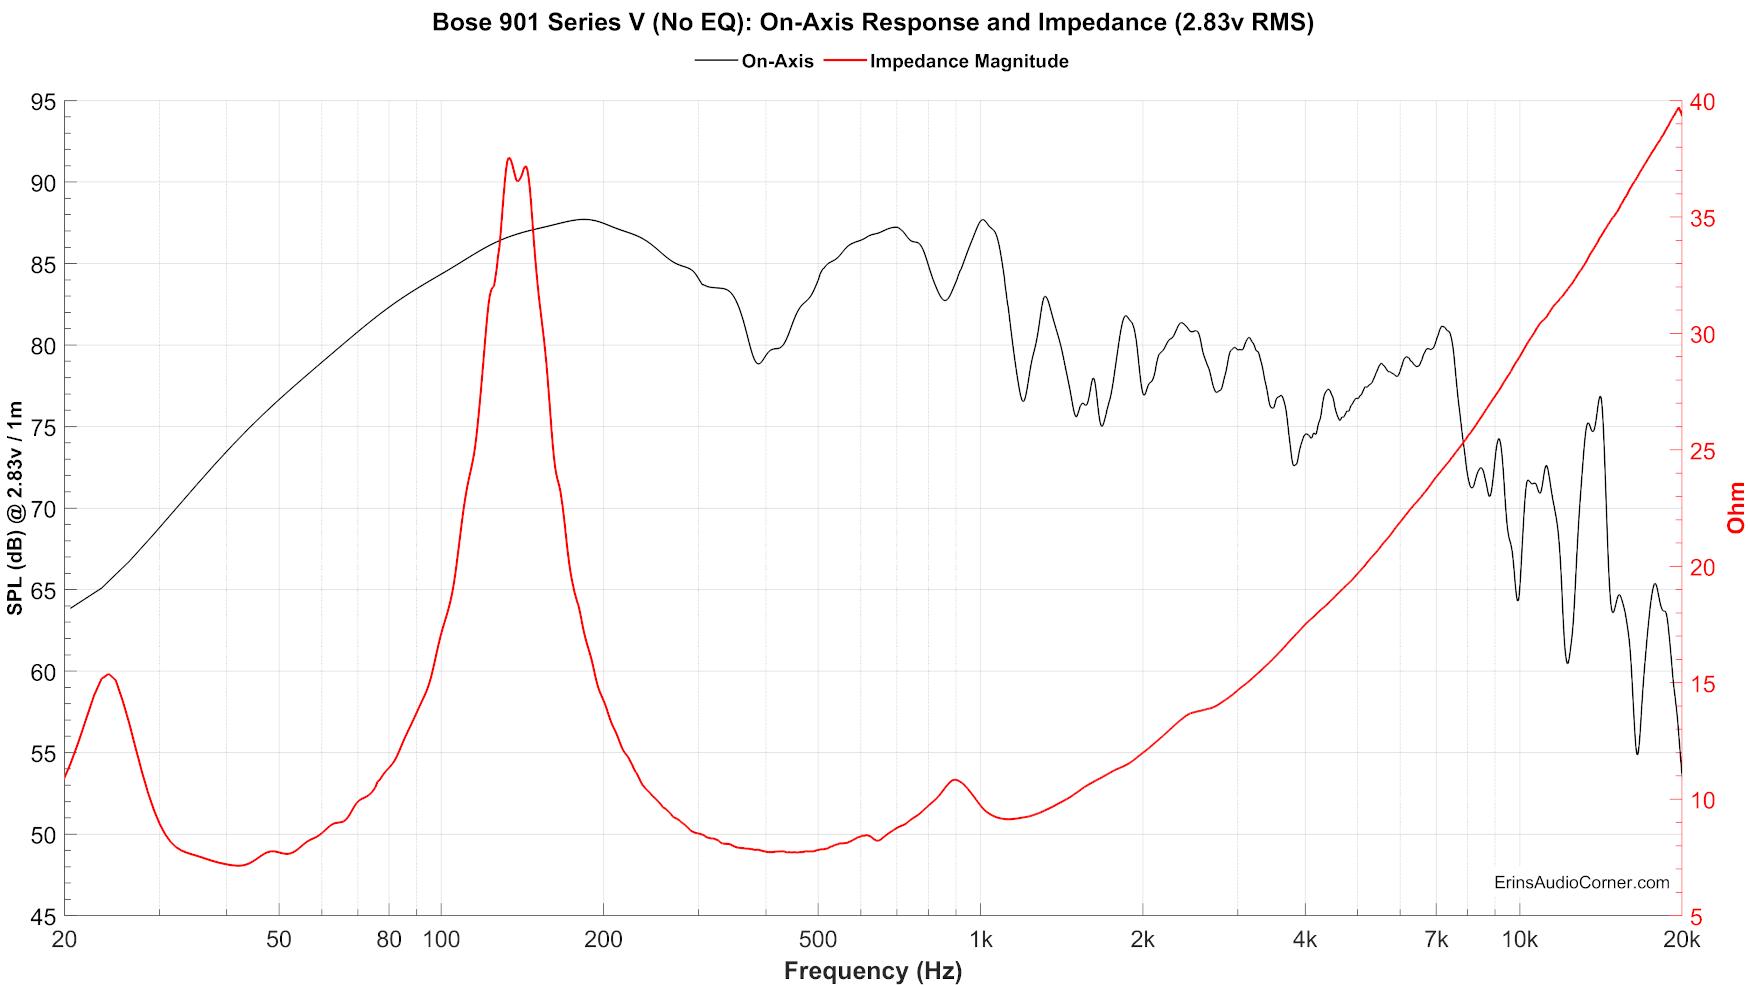 Bose%20901%20Series%20V%20(No%20EQ)_FR_vs_Impedance_2.83v.png